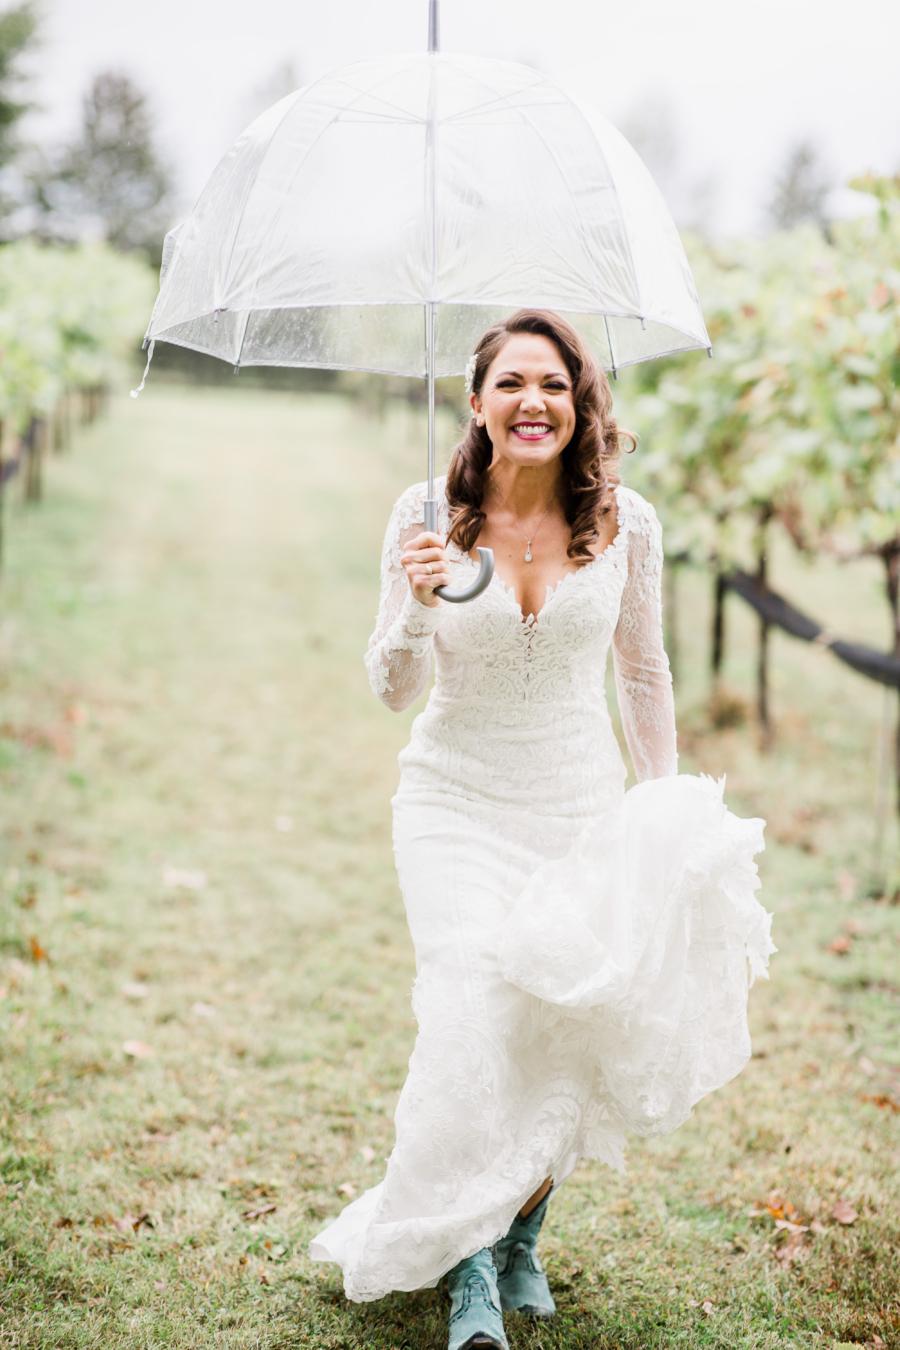 Rainy day bridal portrait